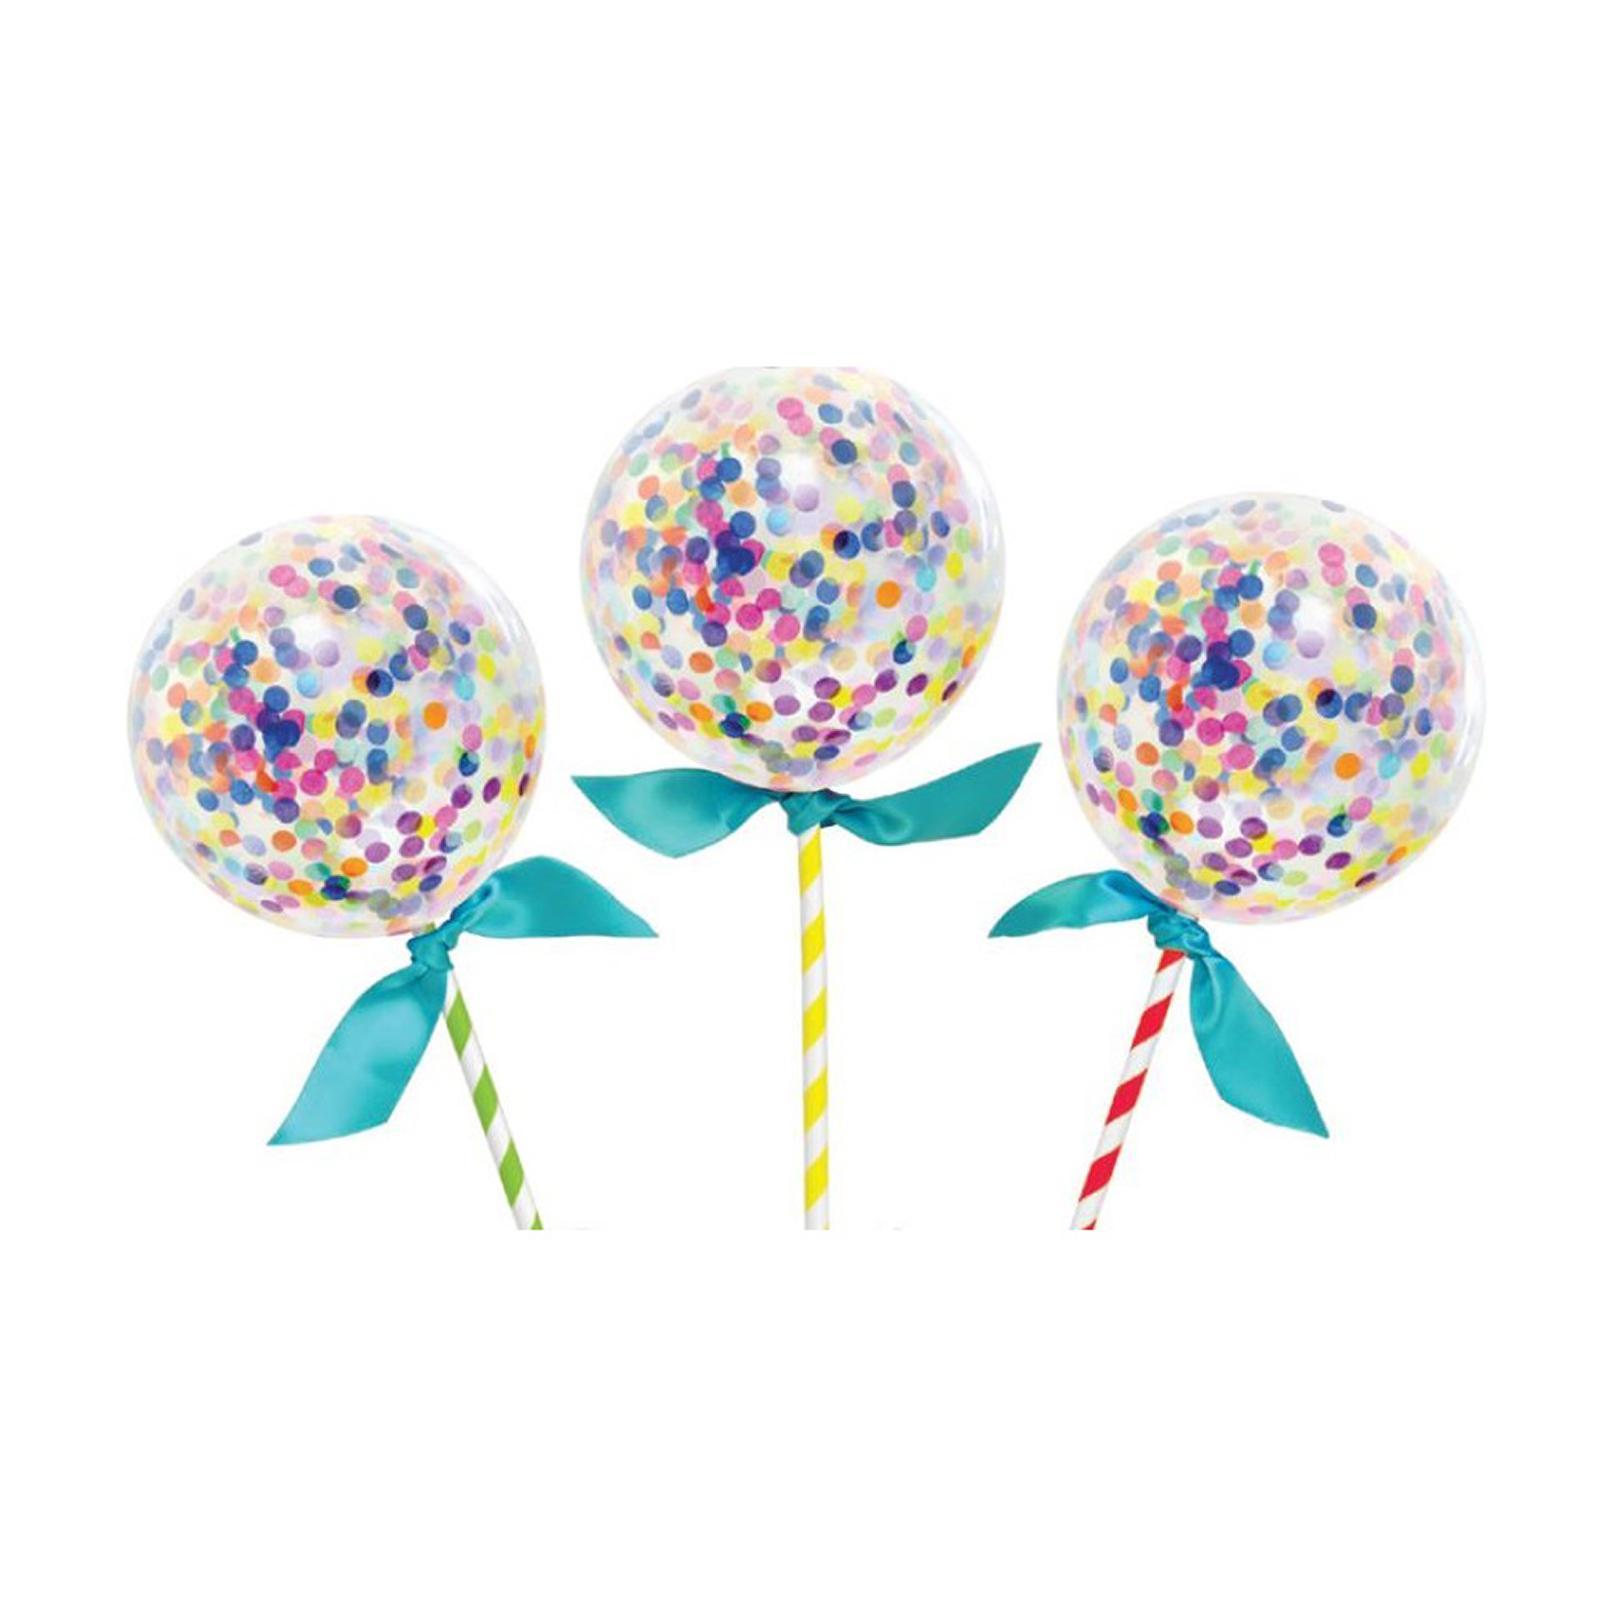 Artwrap Mini Balloon Party Cake Toppers - Confetti